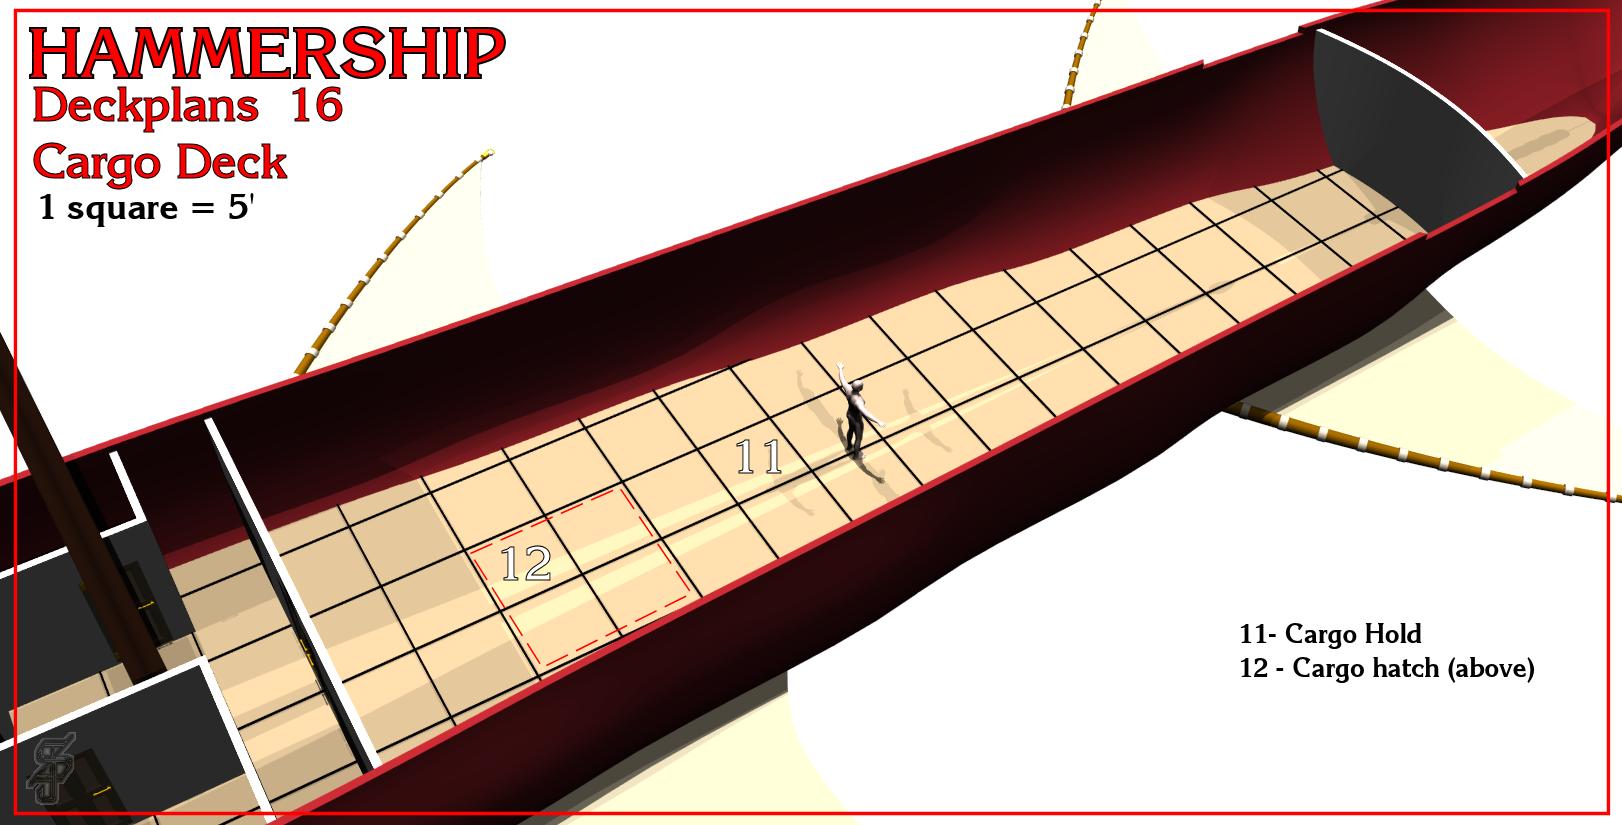 Hammership layout 16